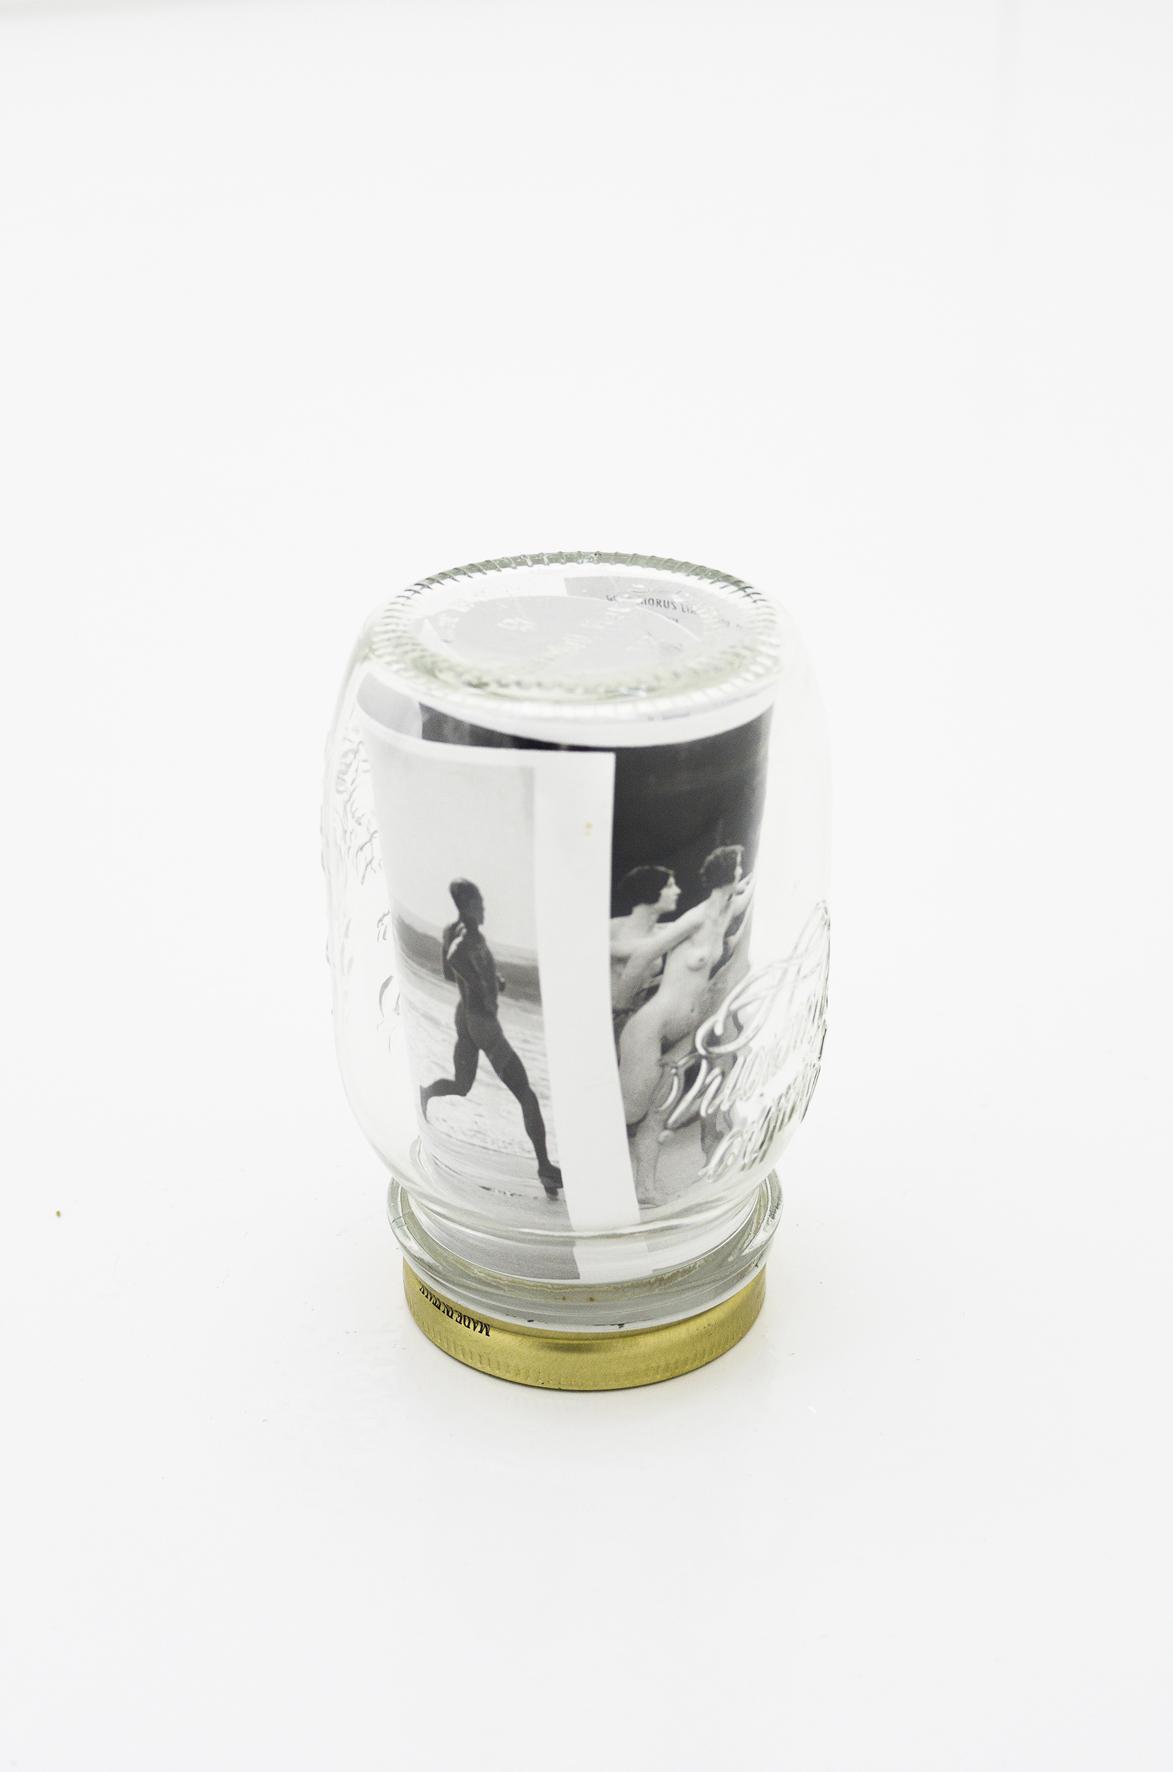 The Recipe (Four Seasons), 2010, jar and postcards, 14 x 9 diam